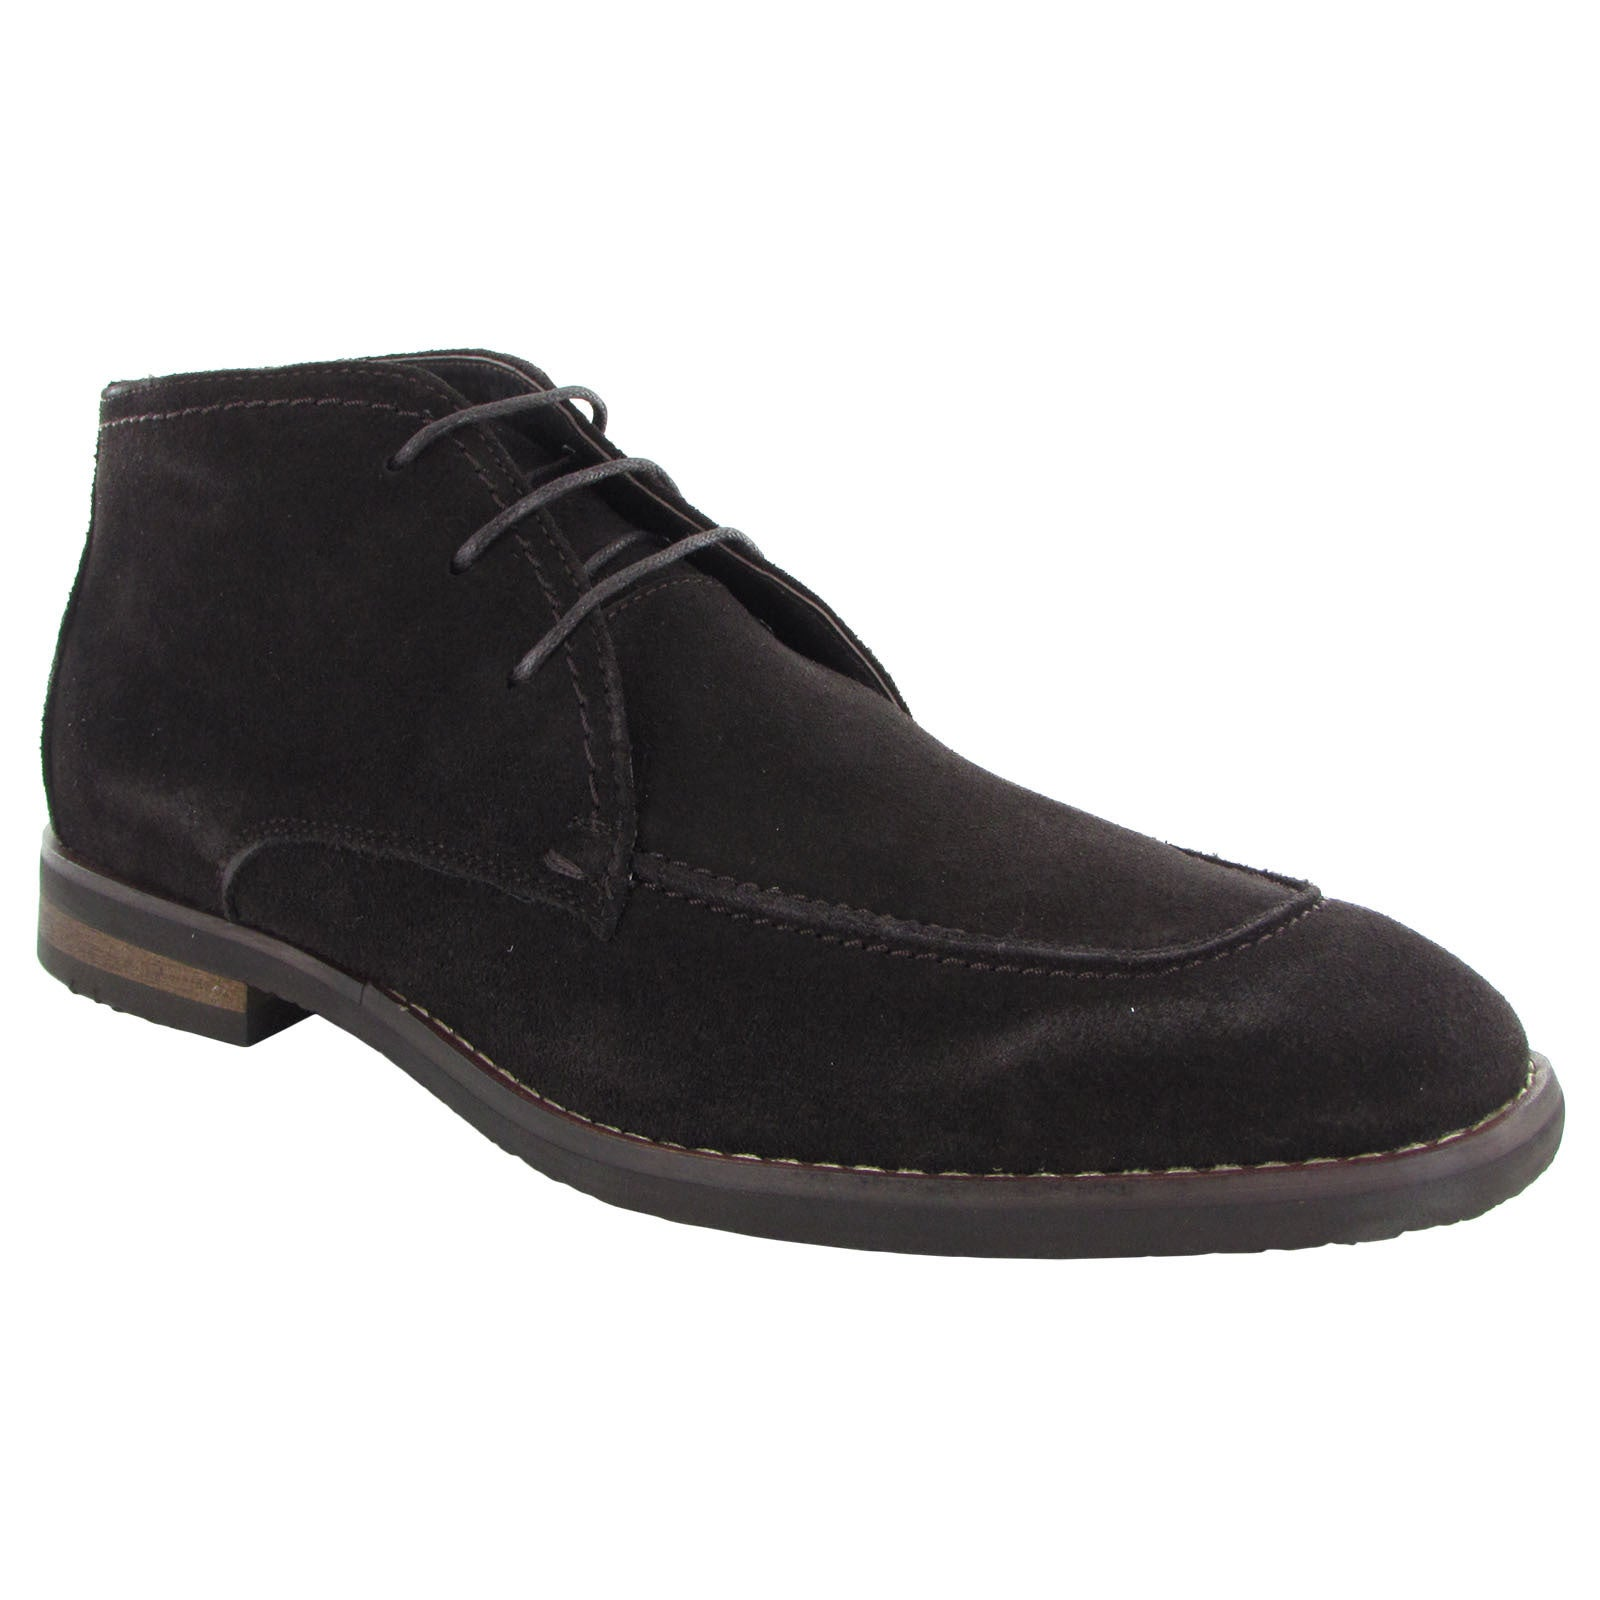 High Quality Robert Wayne Tatum Suede Chukka Boot Mens Black Robert Wayne Mens Boots